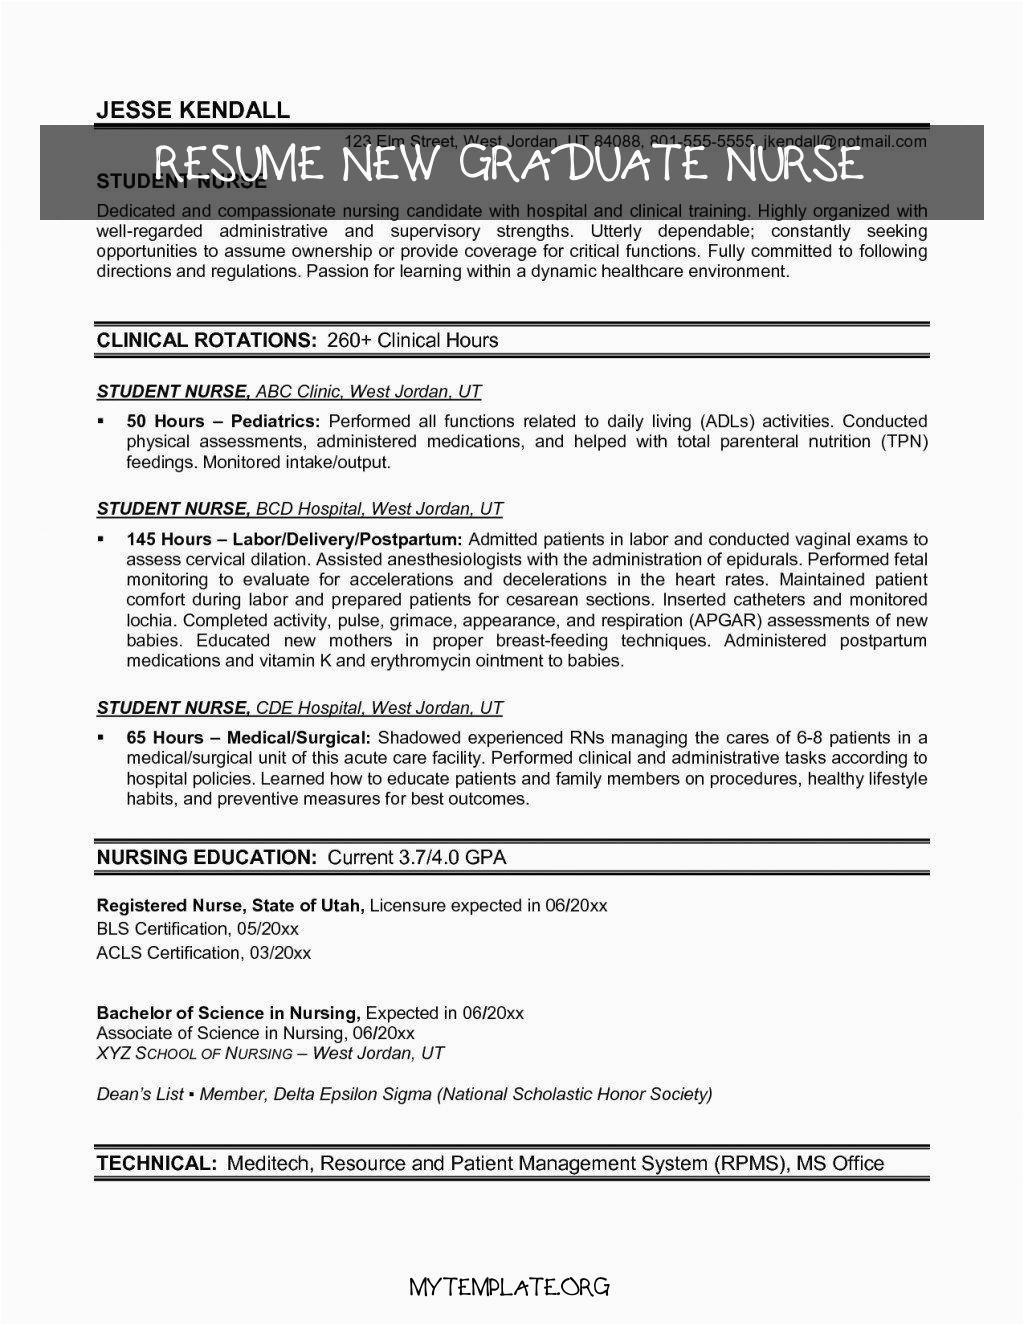 resume new graduate nurse of new grad rn resume luxury recent graduate resume template salumguilher